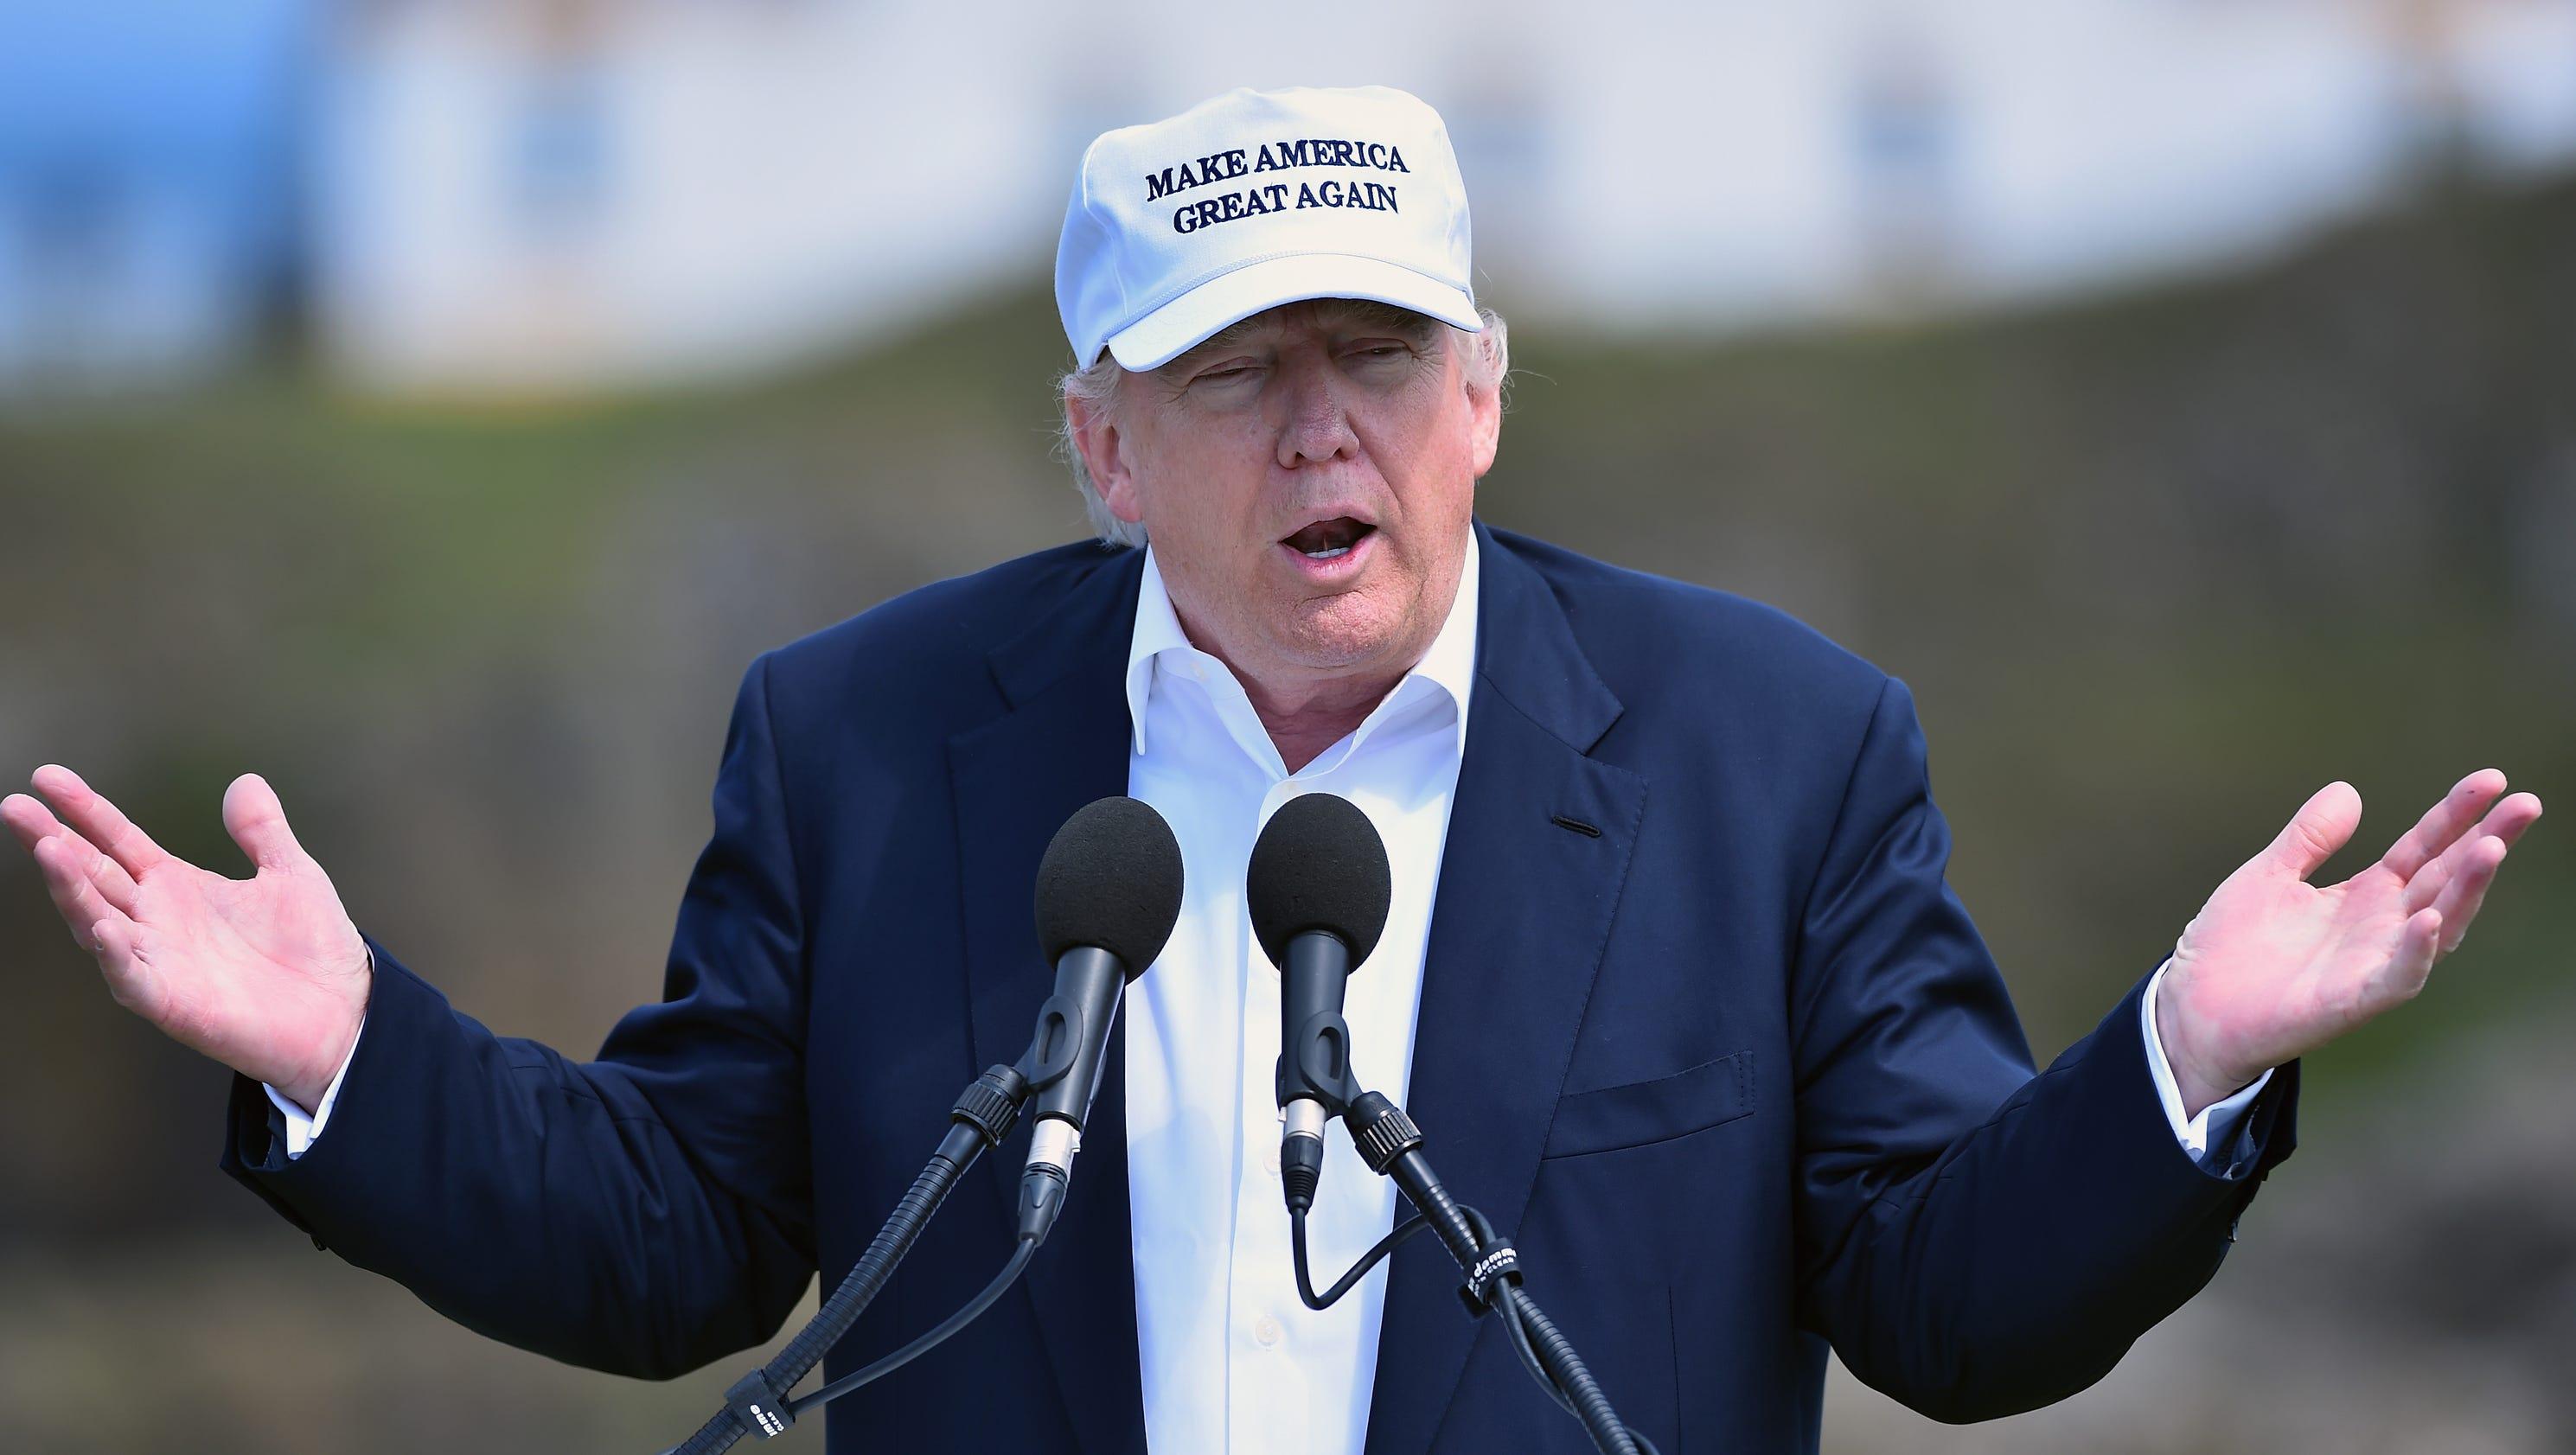 Facebook co-founder pledges $20 million to defeat Donald Trump